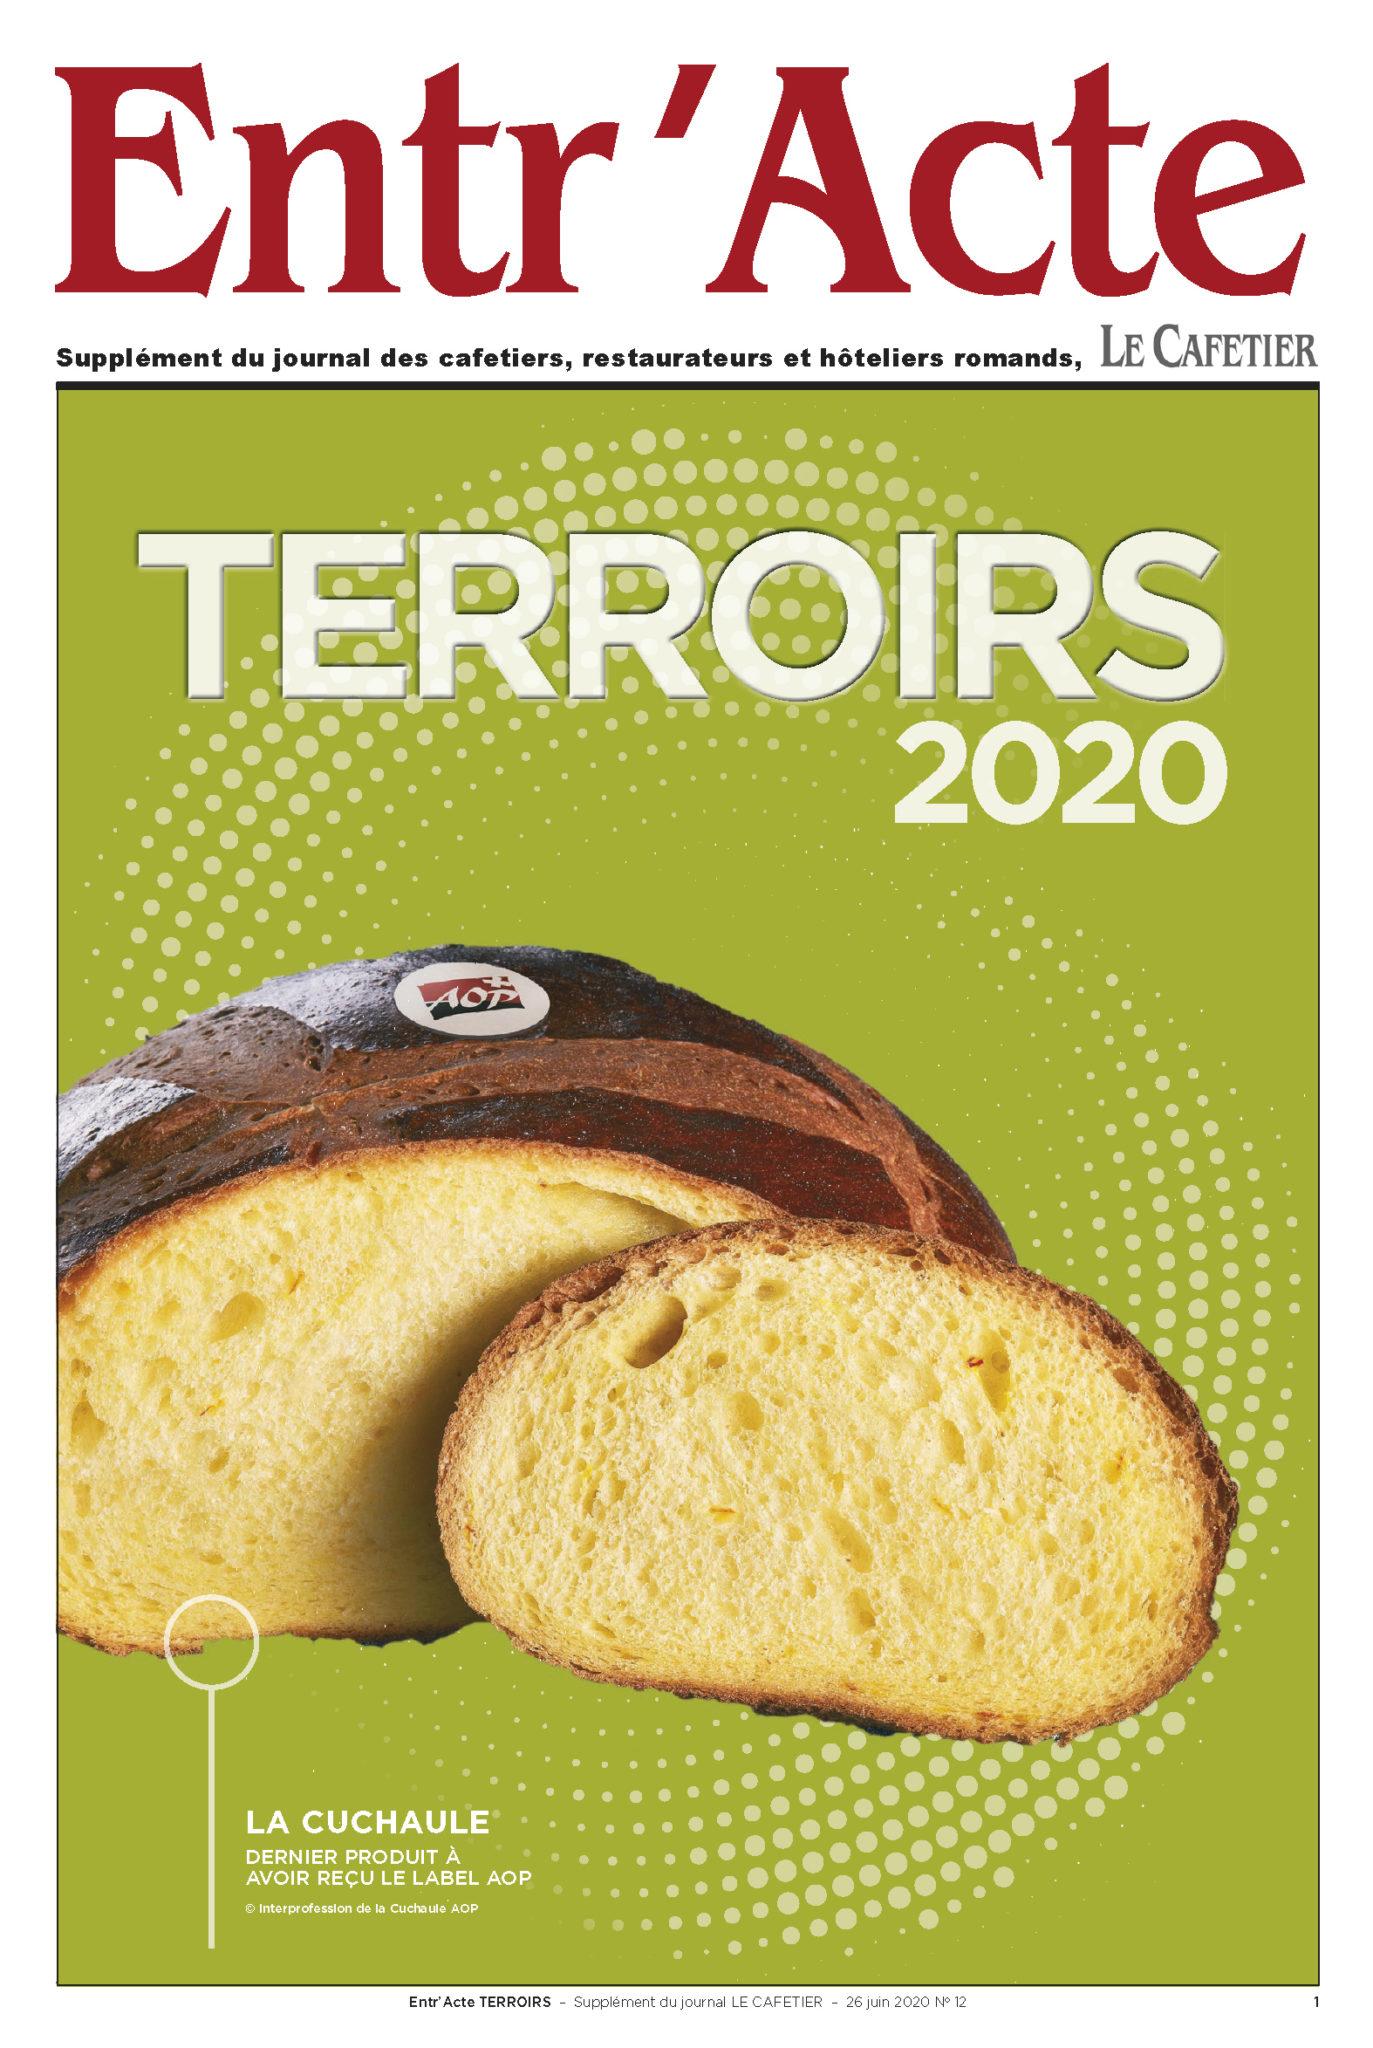 Entr'Acte Terroirs 2020